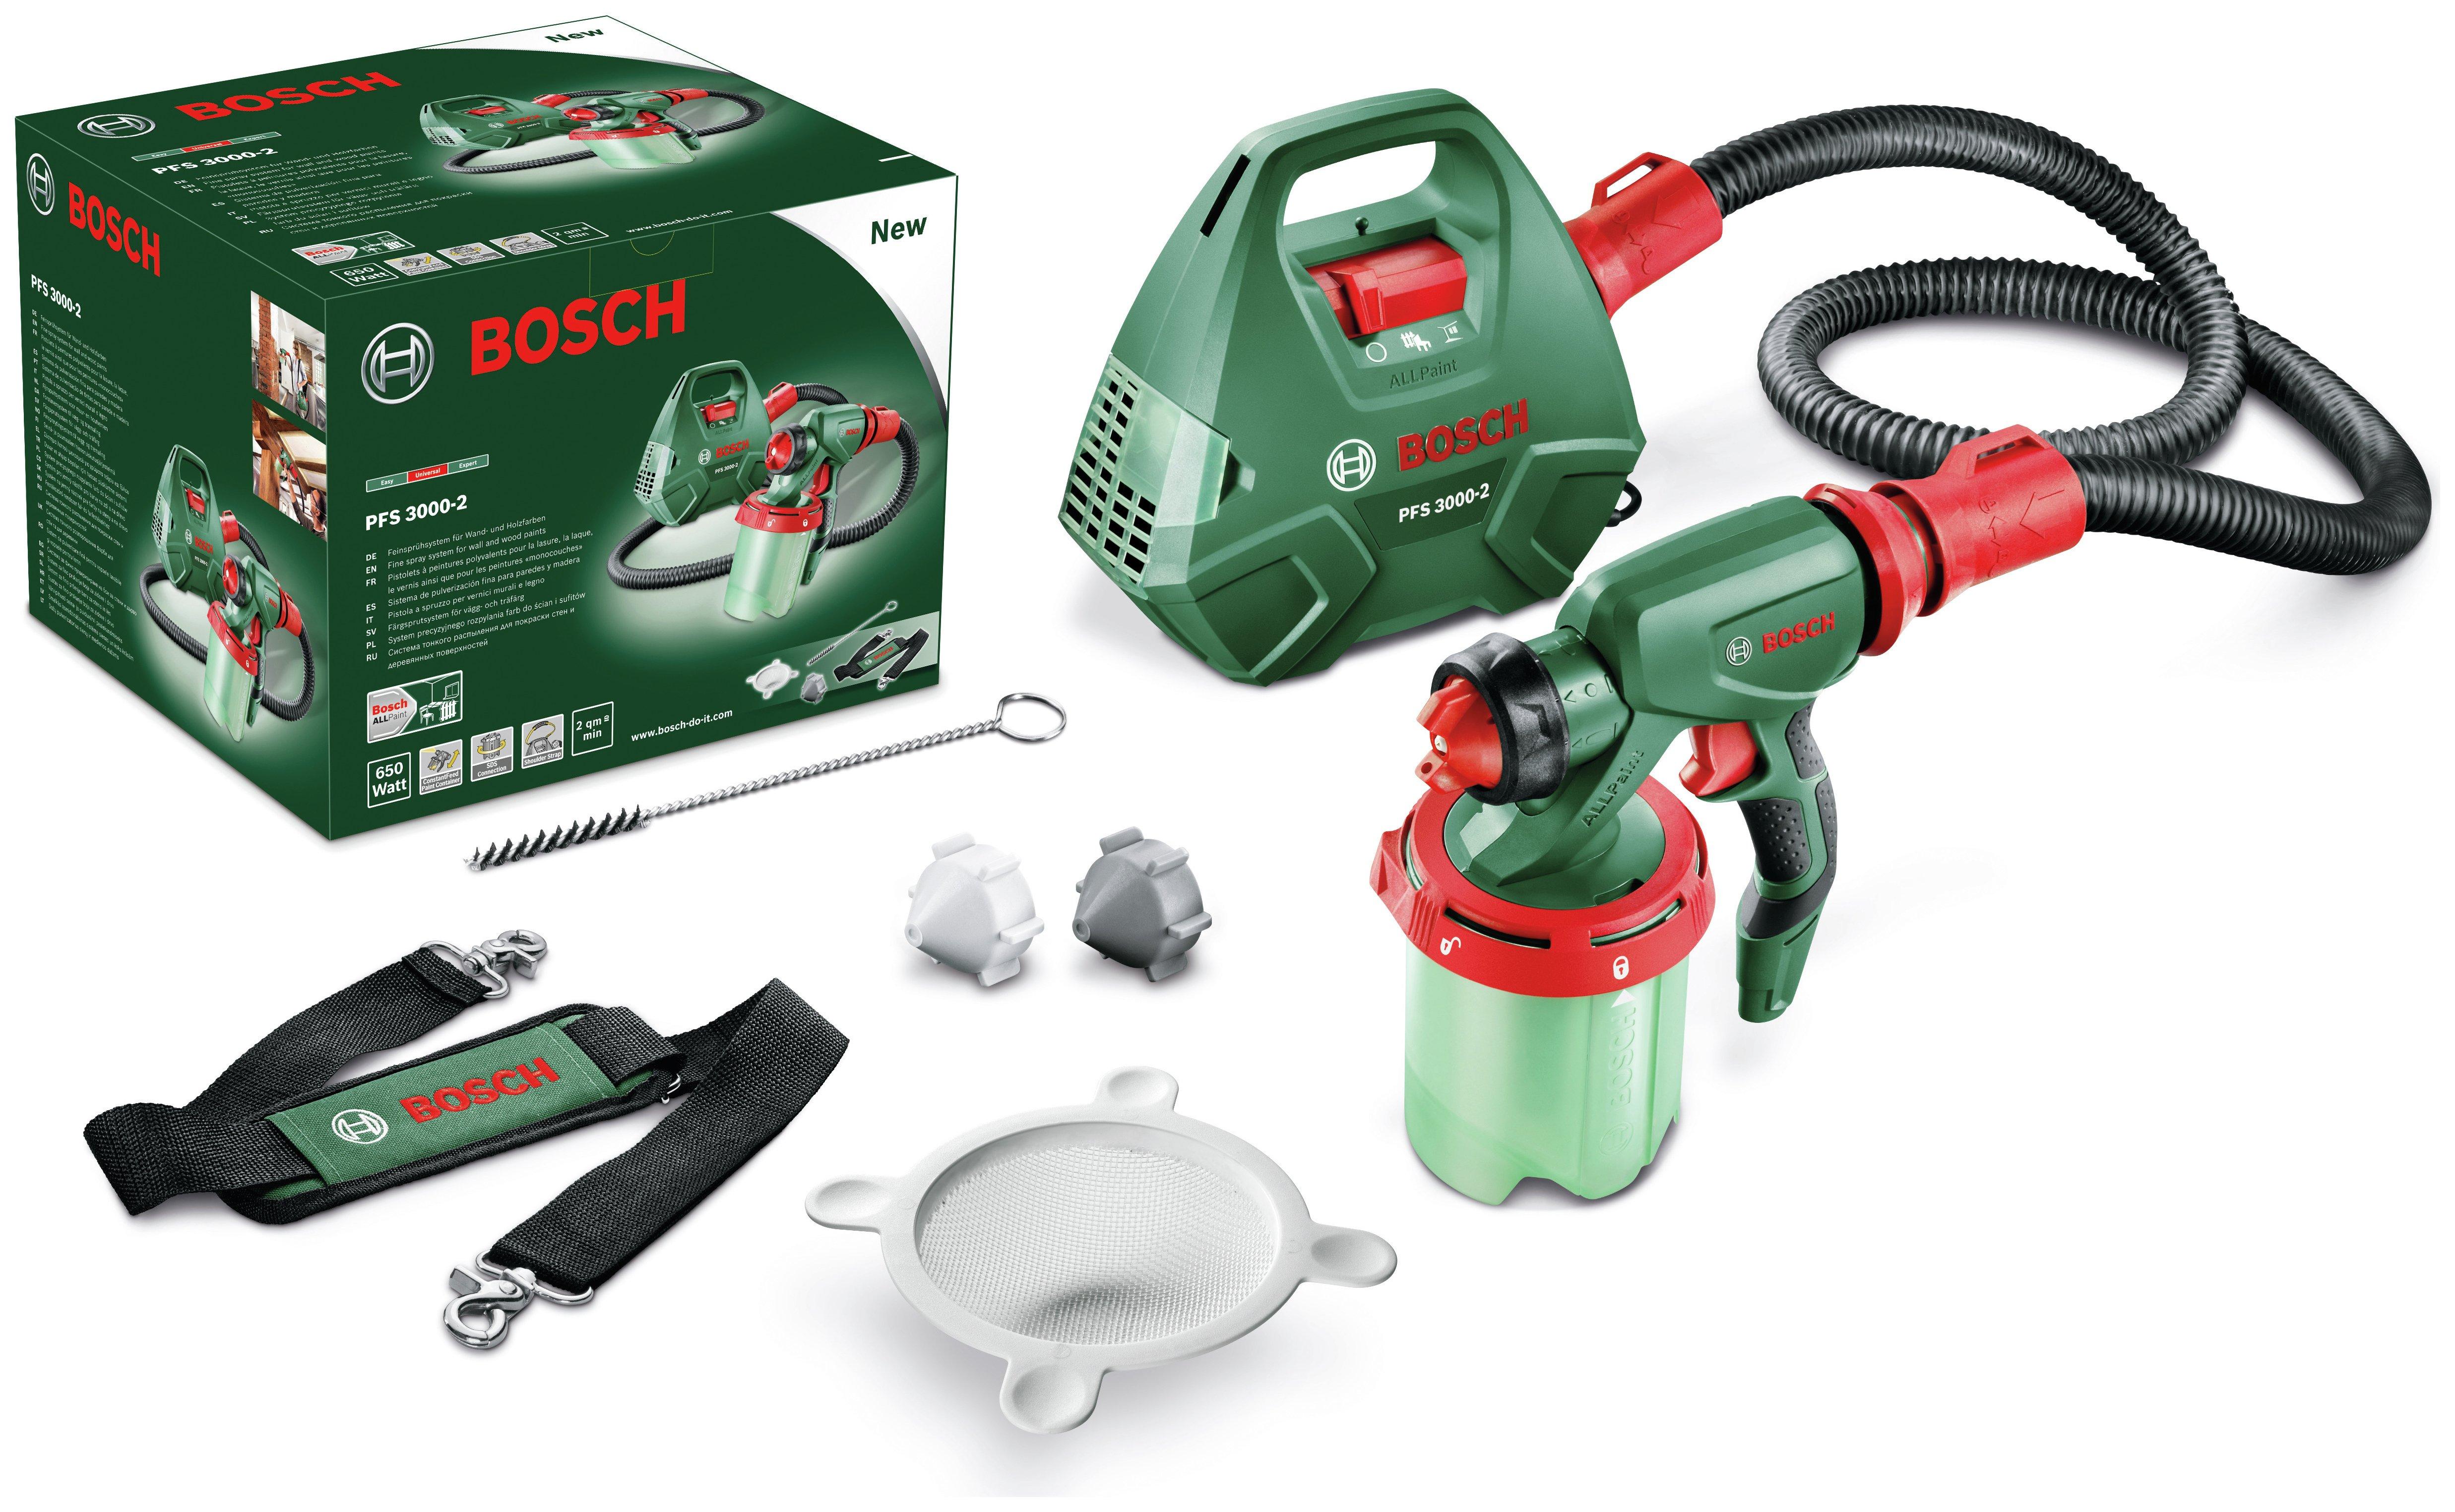 Bosch Pfs 30002 All Paint Spray System Sprays Paint Supplies